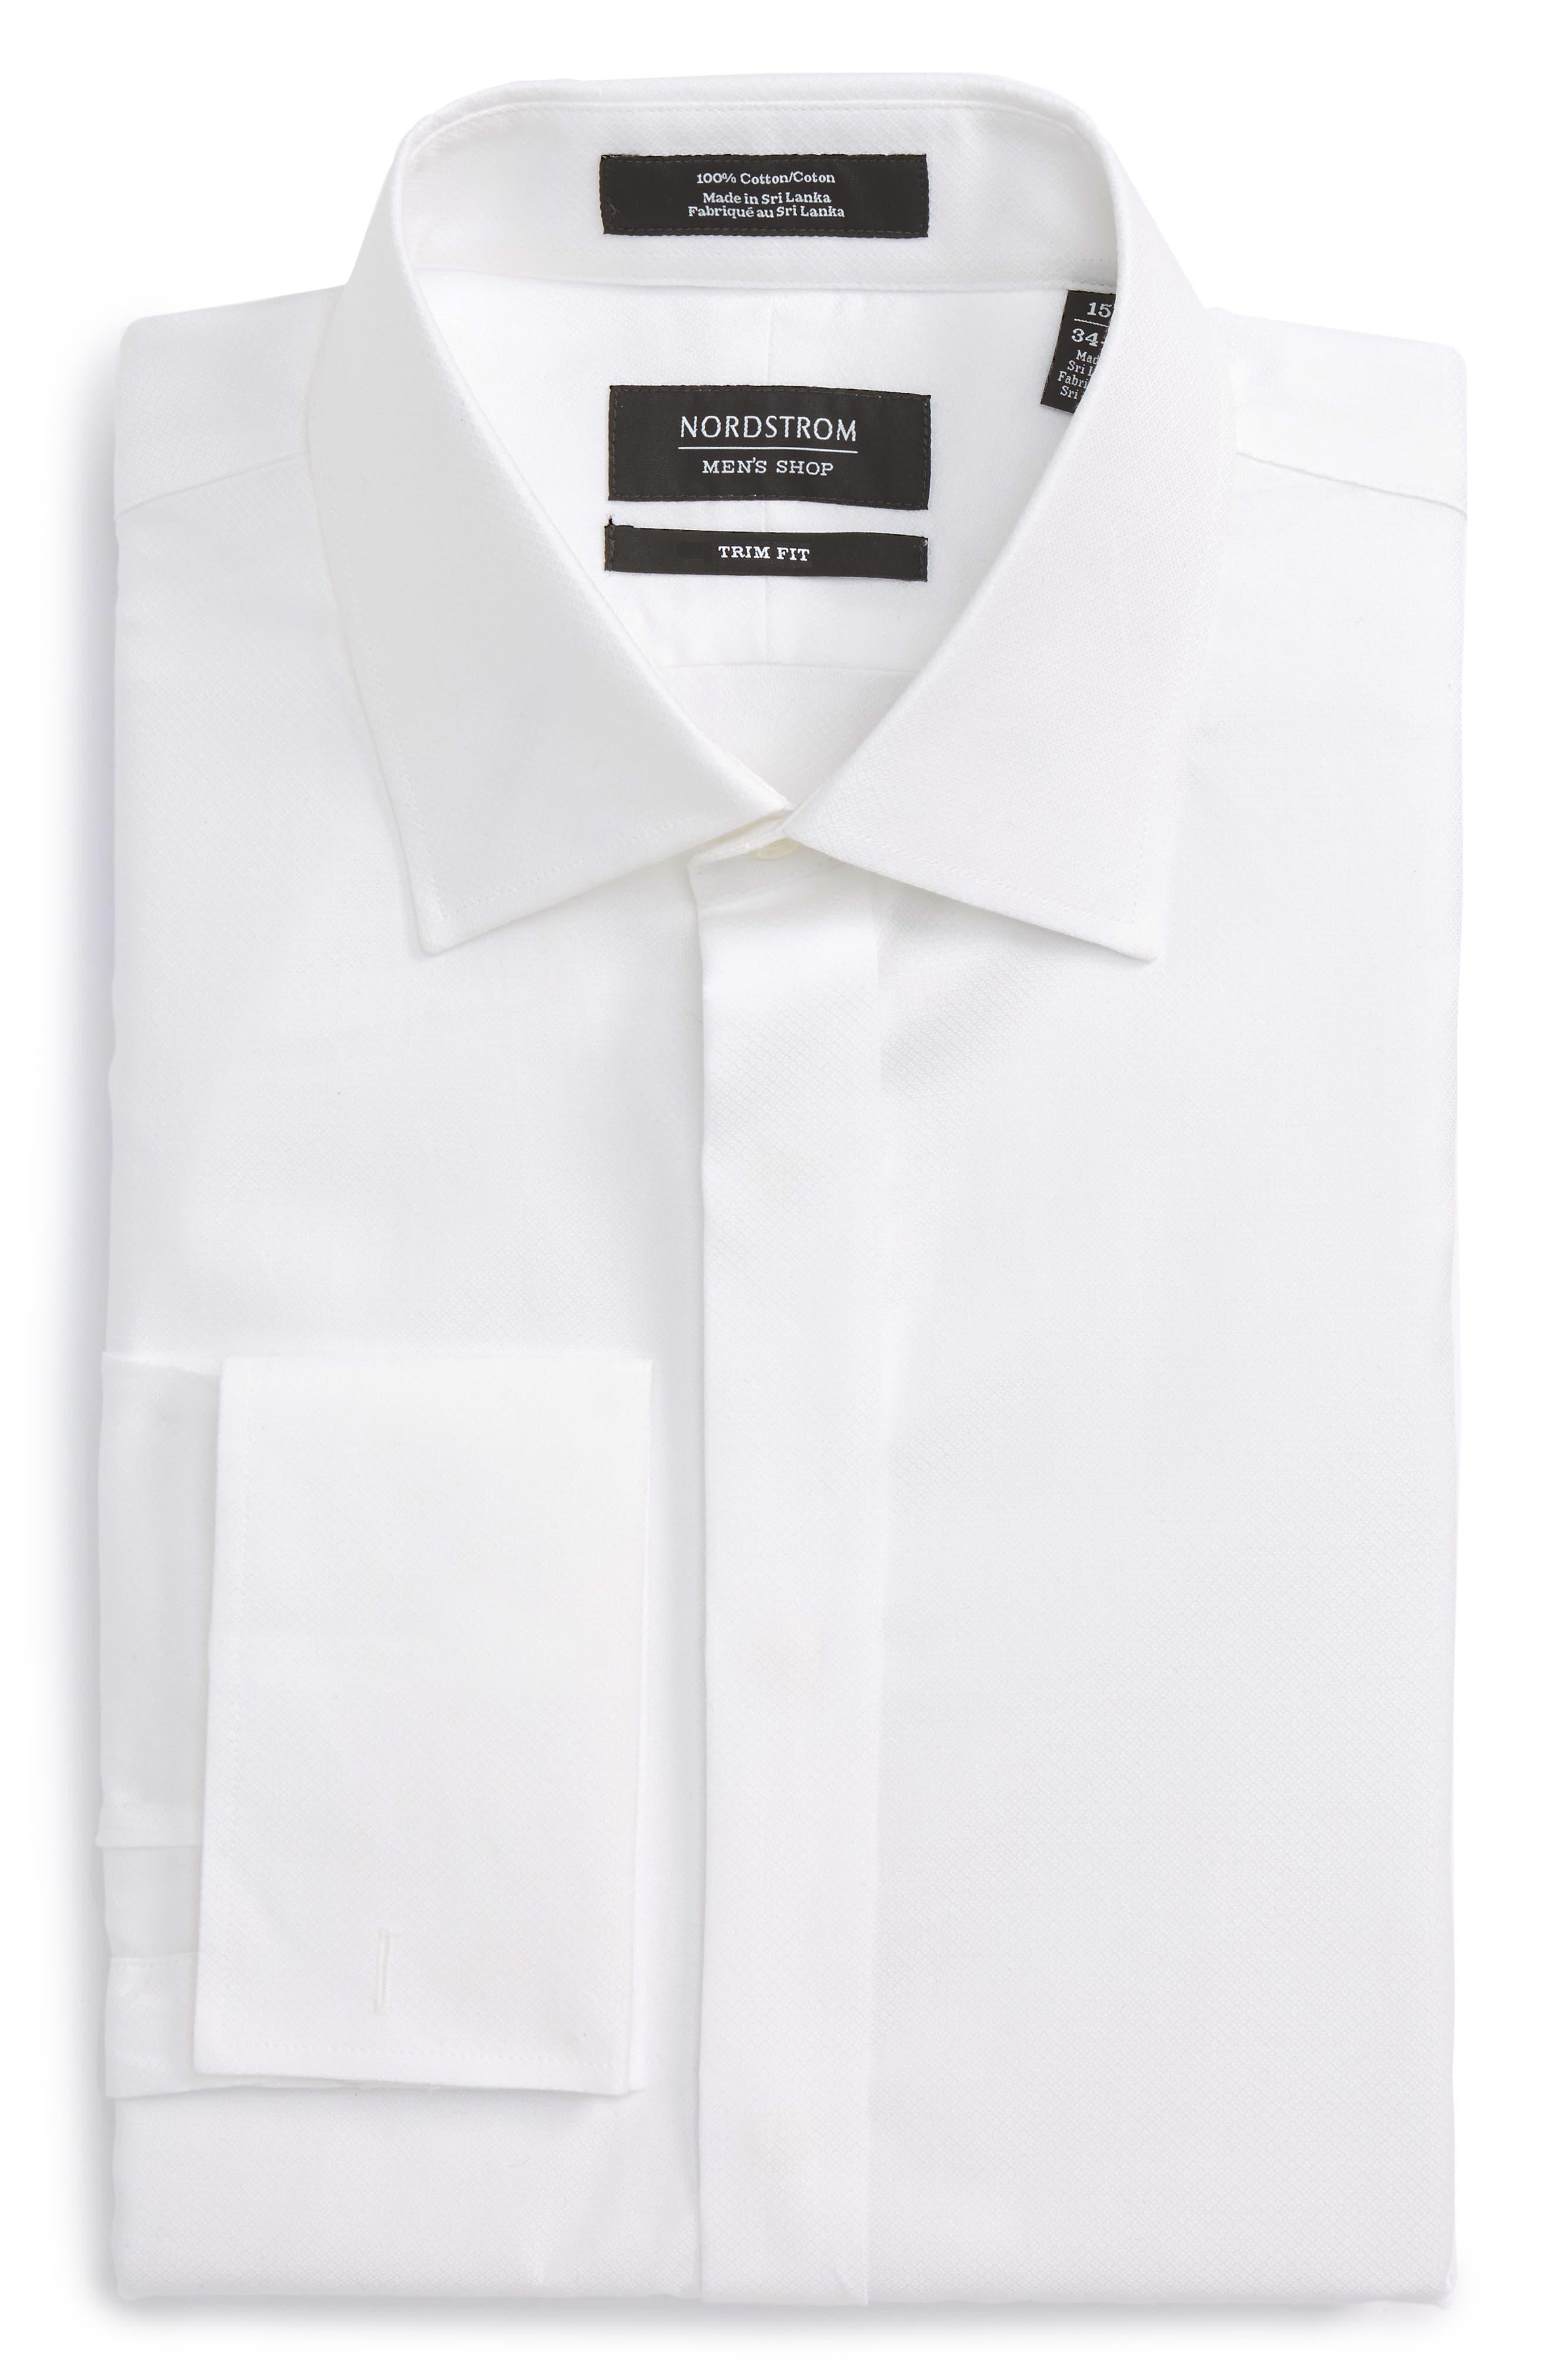 Nordstrom Regular Fit Tuxedo Shirt